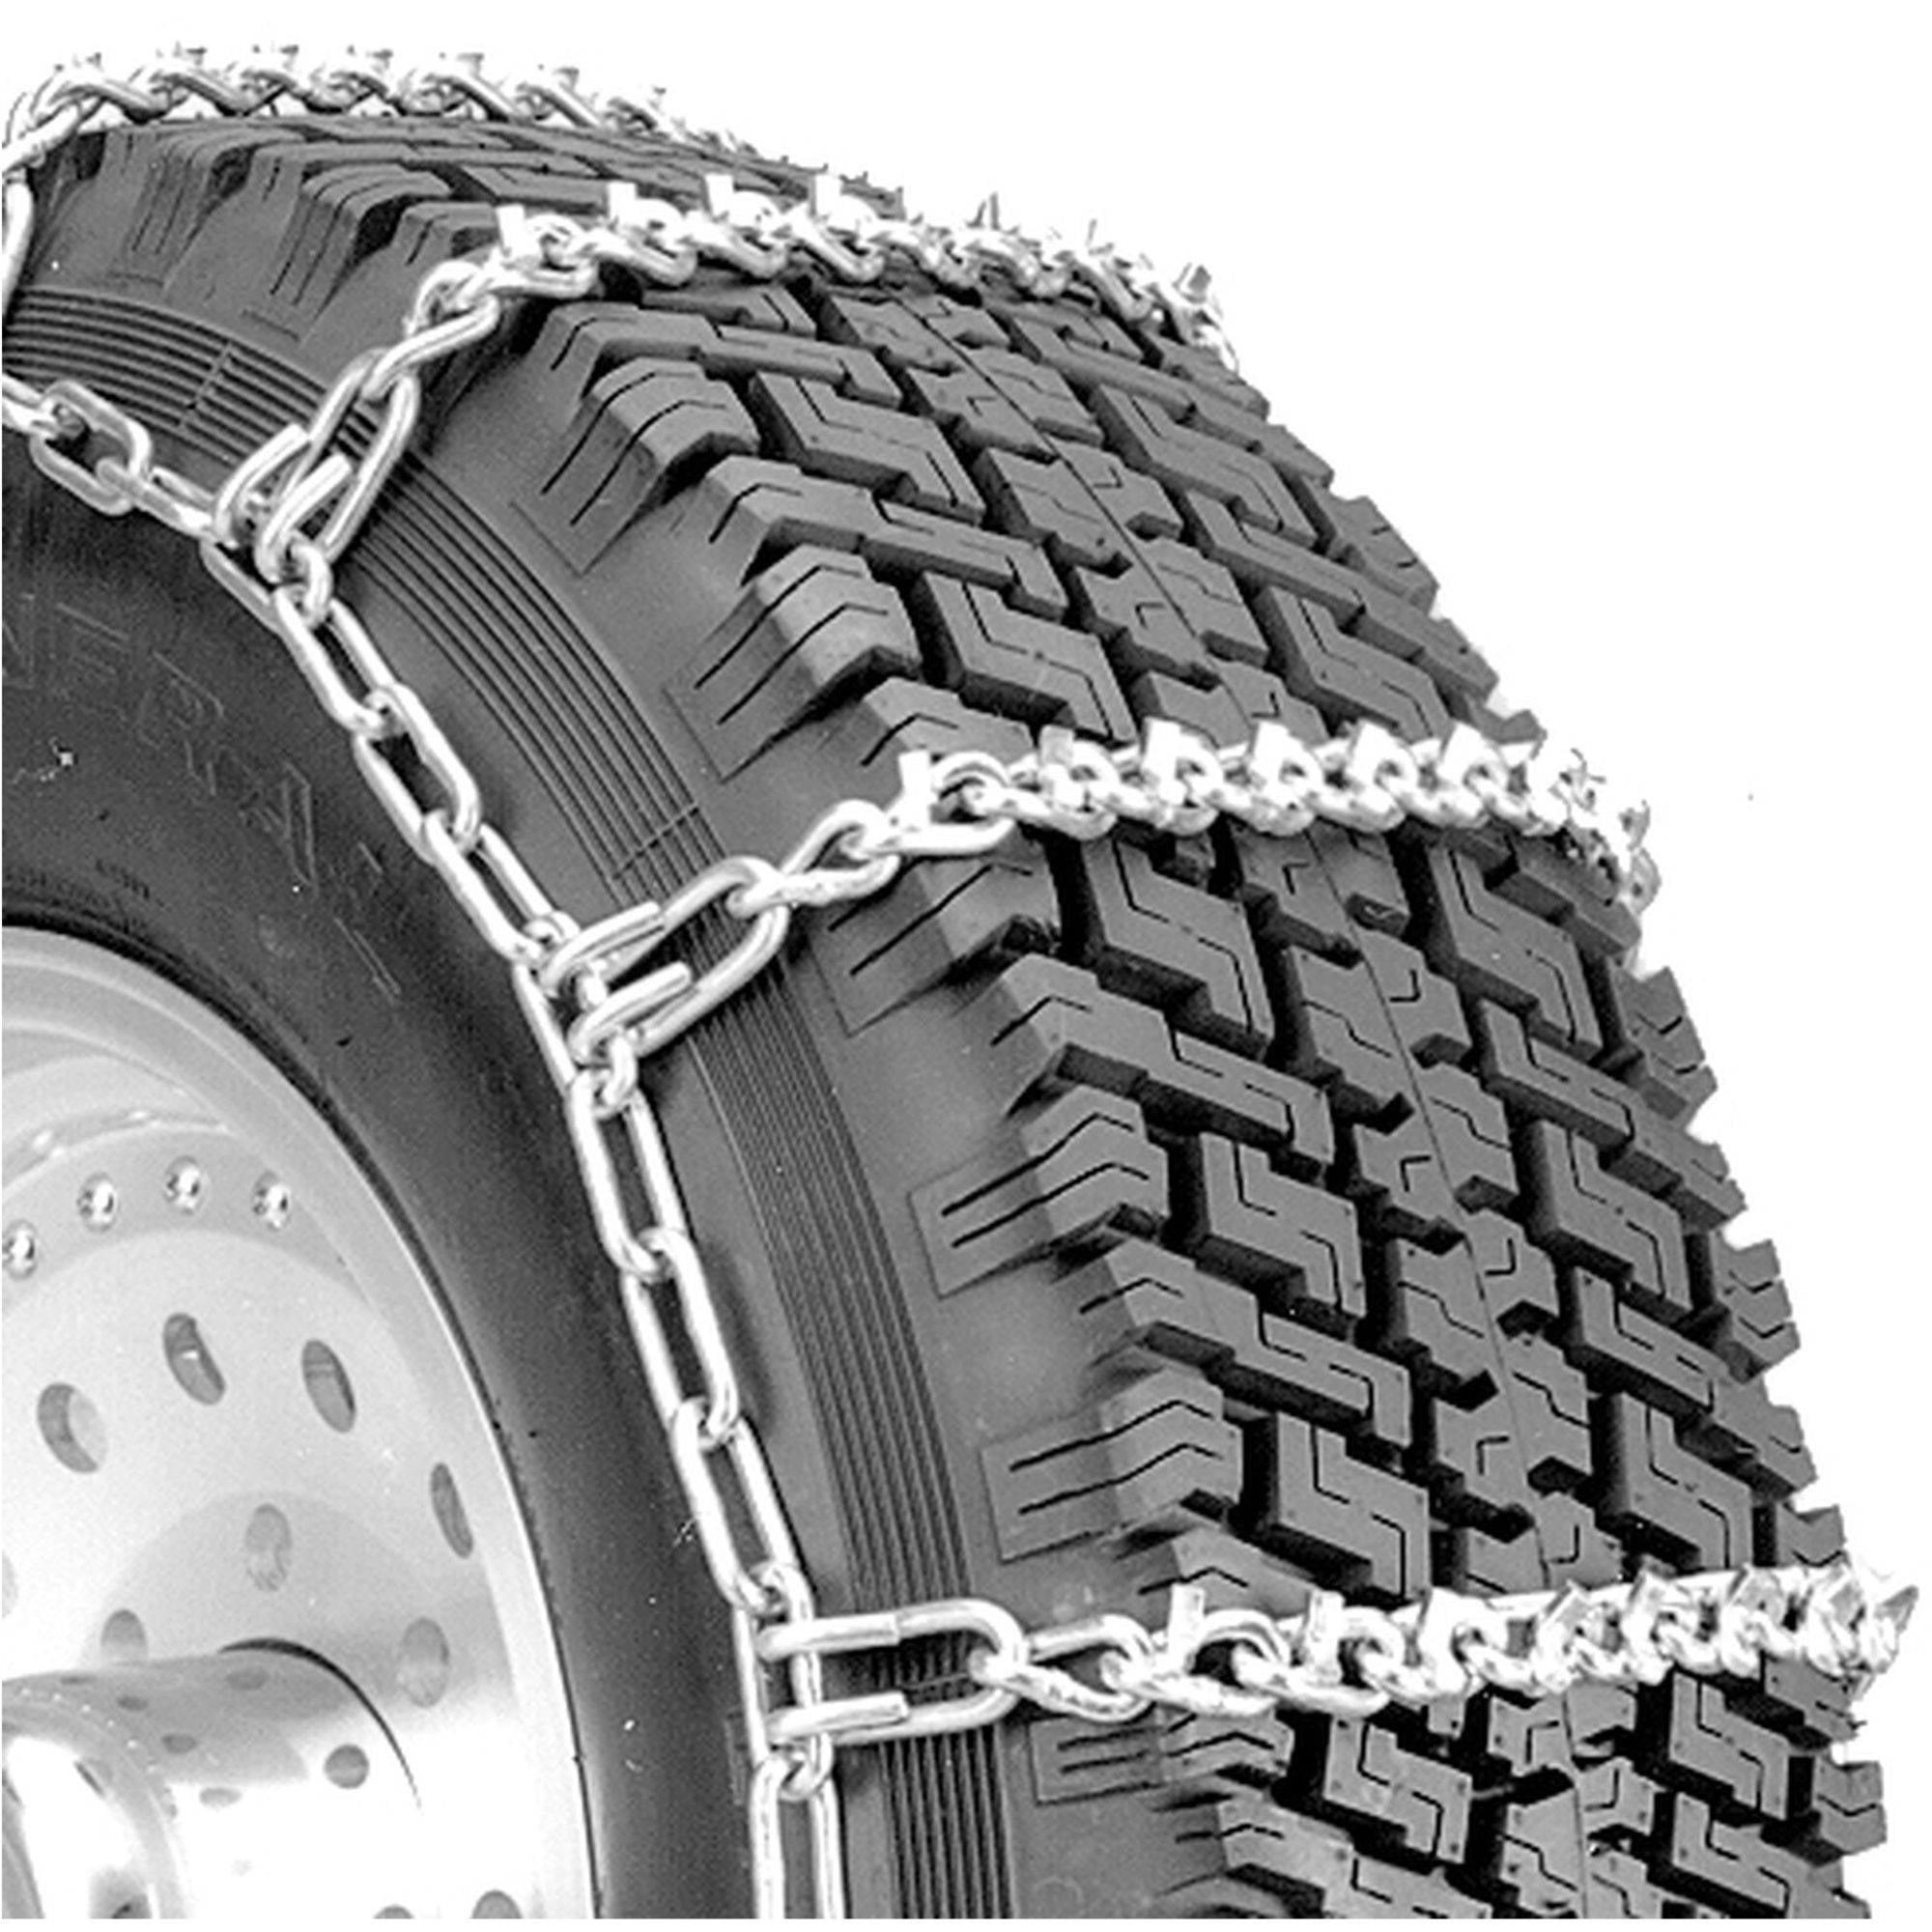 Peerless Chain Light Truck V-Bar Tire Chains, #QG2829 by Peerless Chain Company